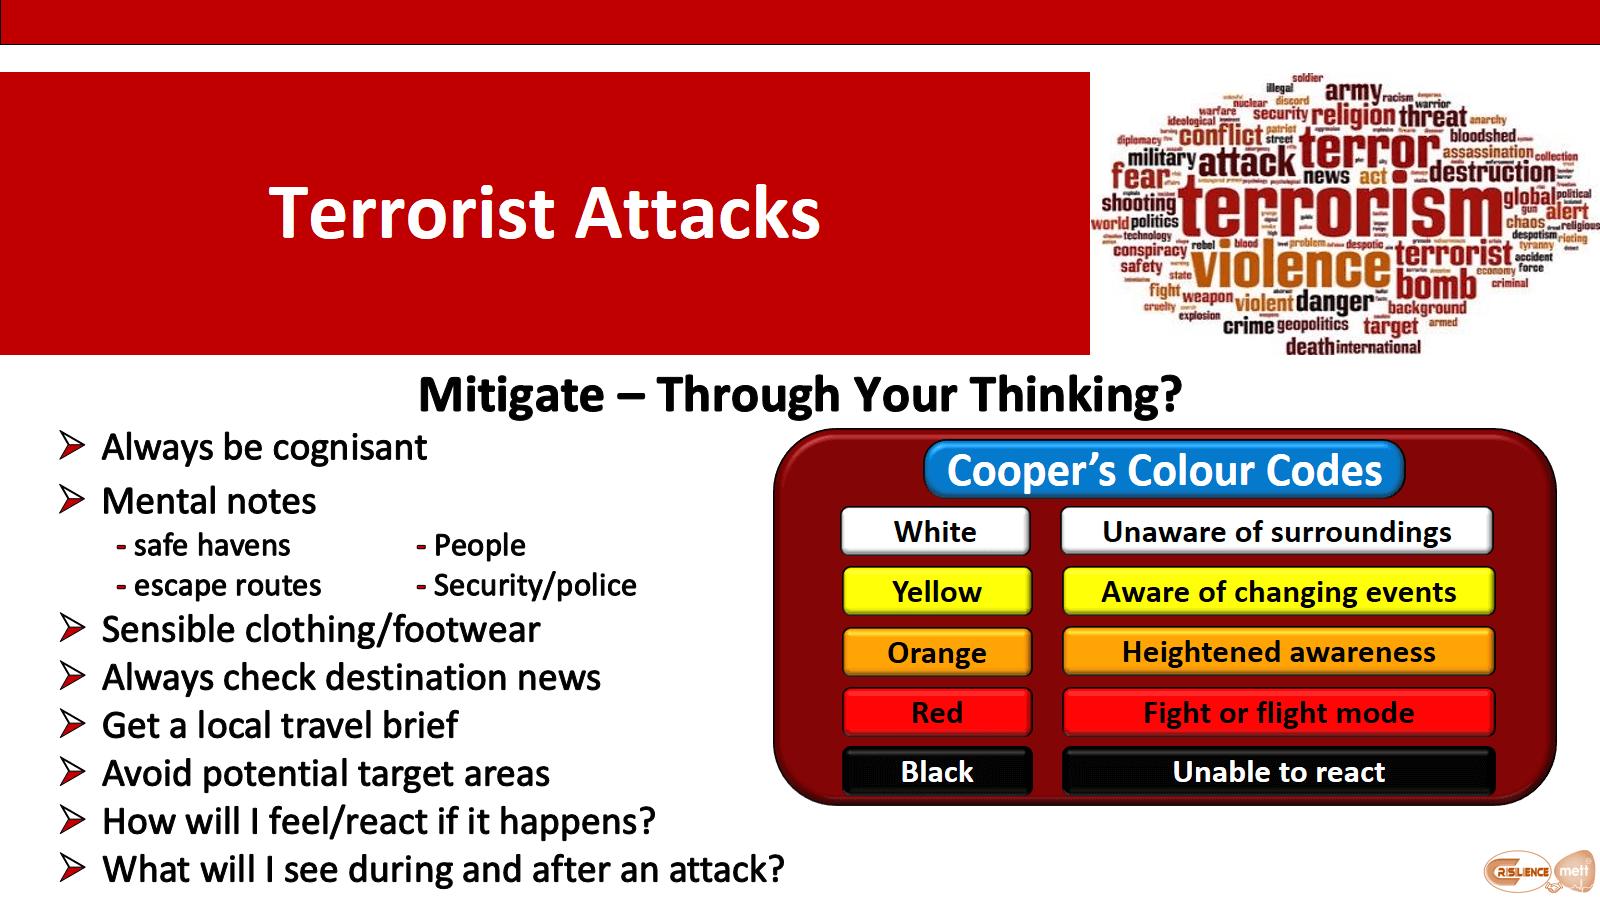 CIMAT slide 11 Terror Attacks Mitigate through your thinking